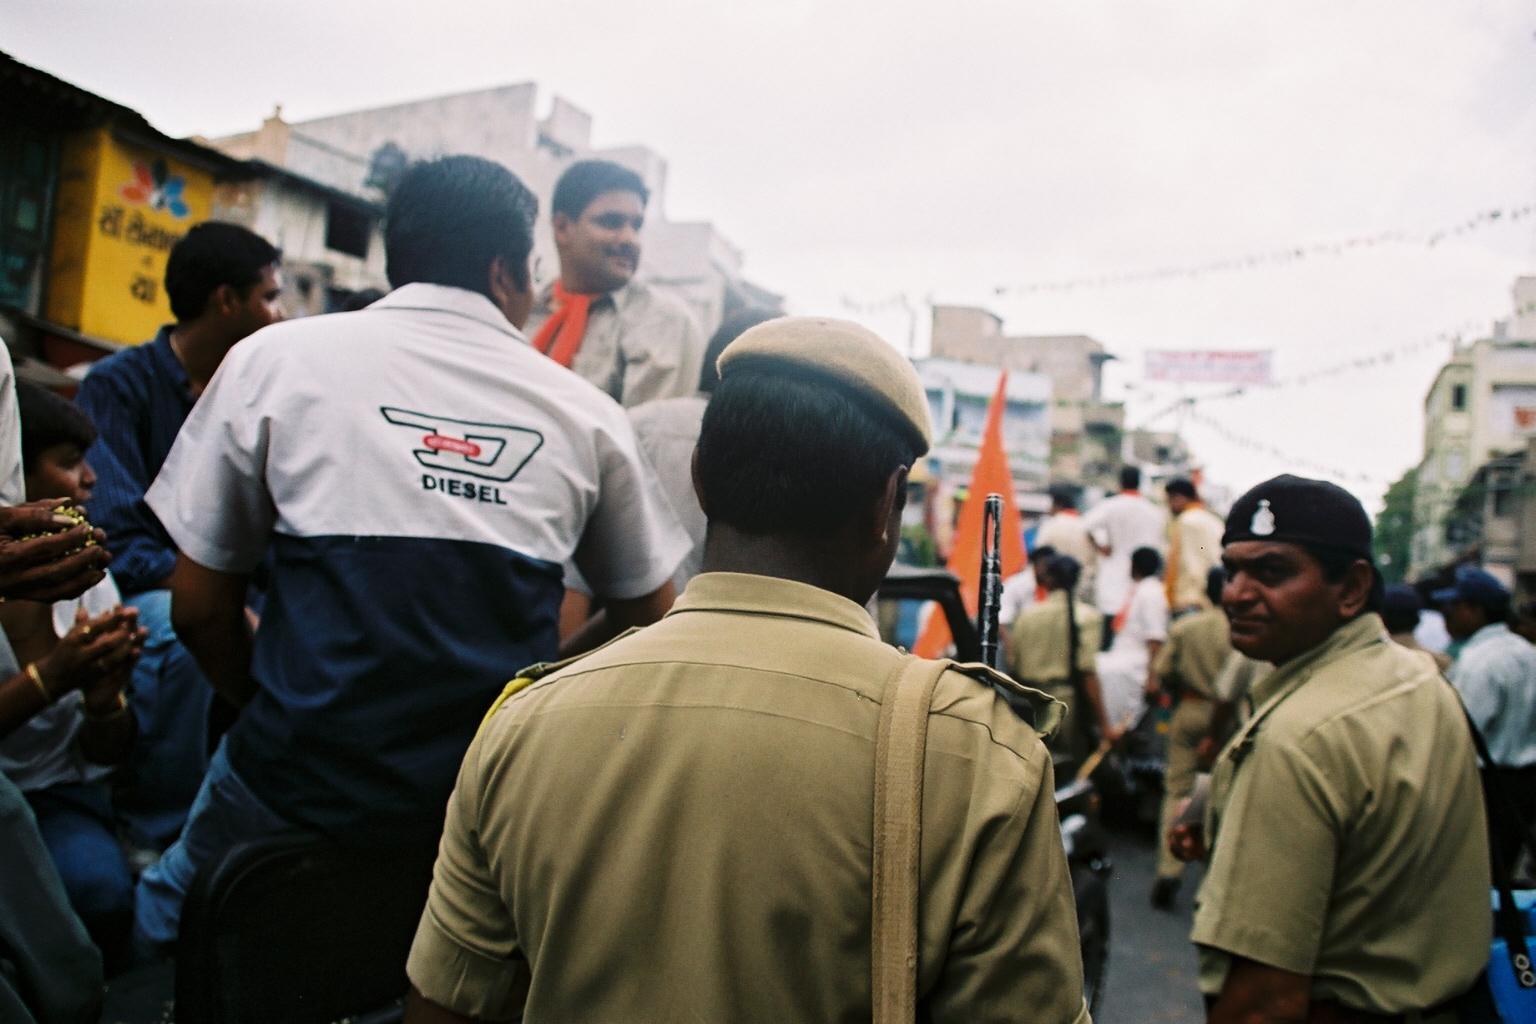 Police Anti-Emeute